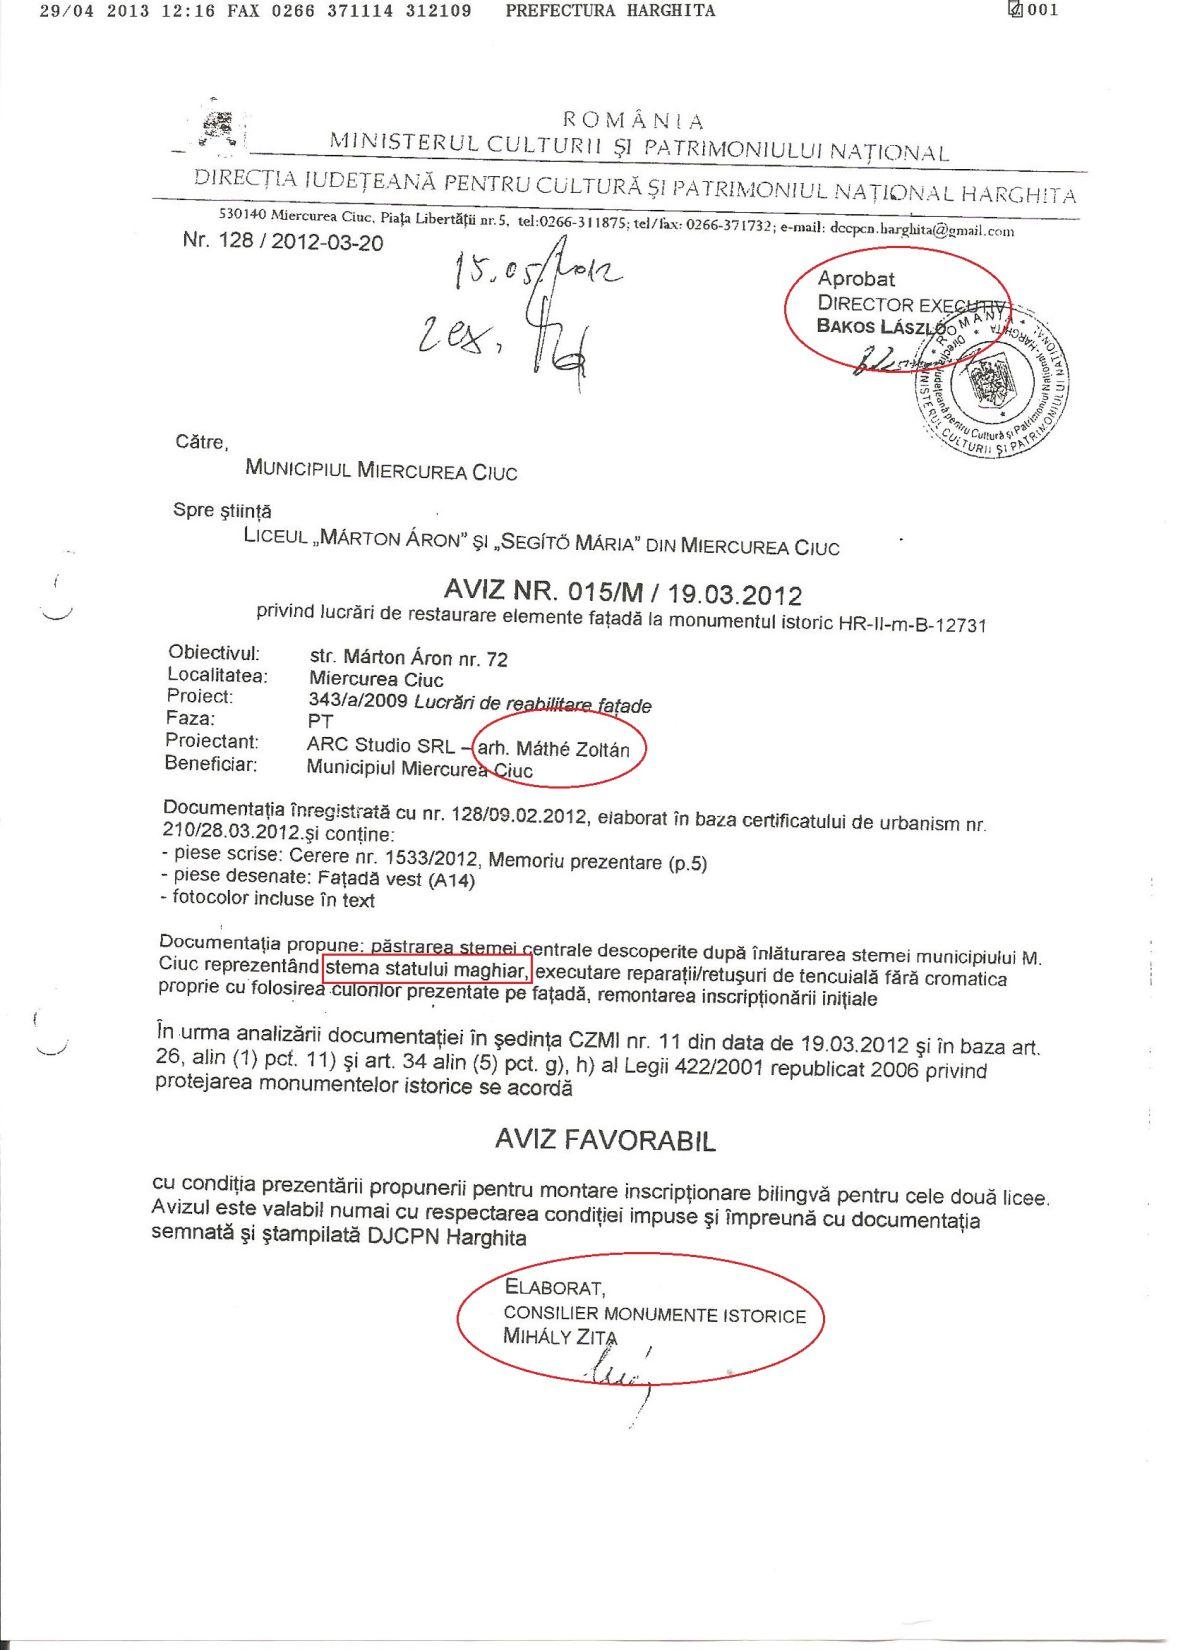 Aviz Marton Aron Miercurea Ciuc MAI steme Ungaria scoli Harghita Victor Ponta UDMR Ungaria Mare